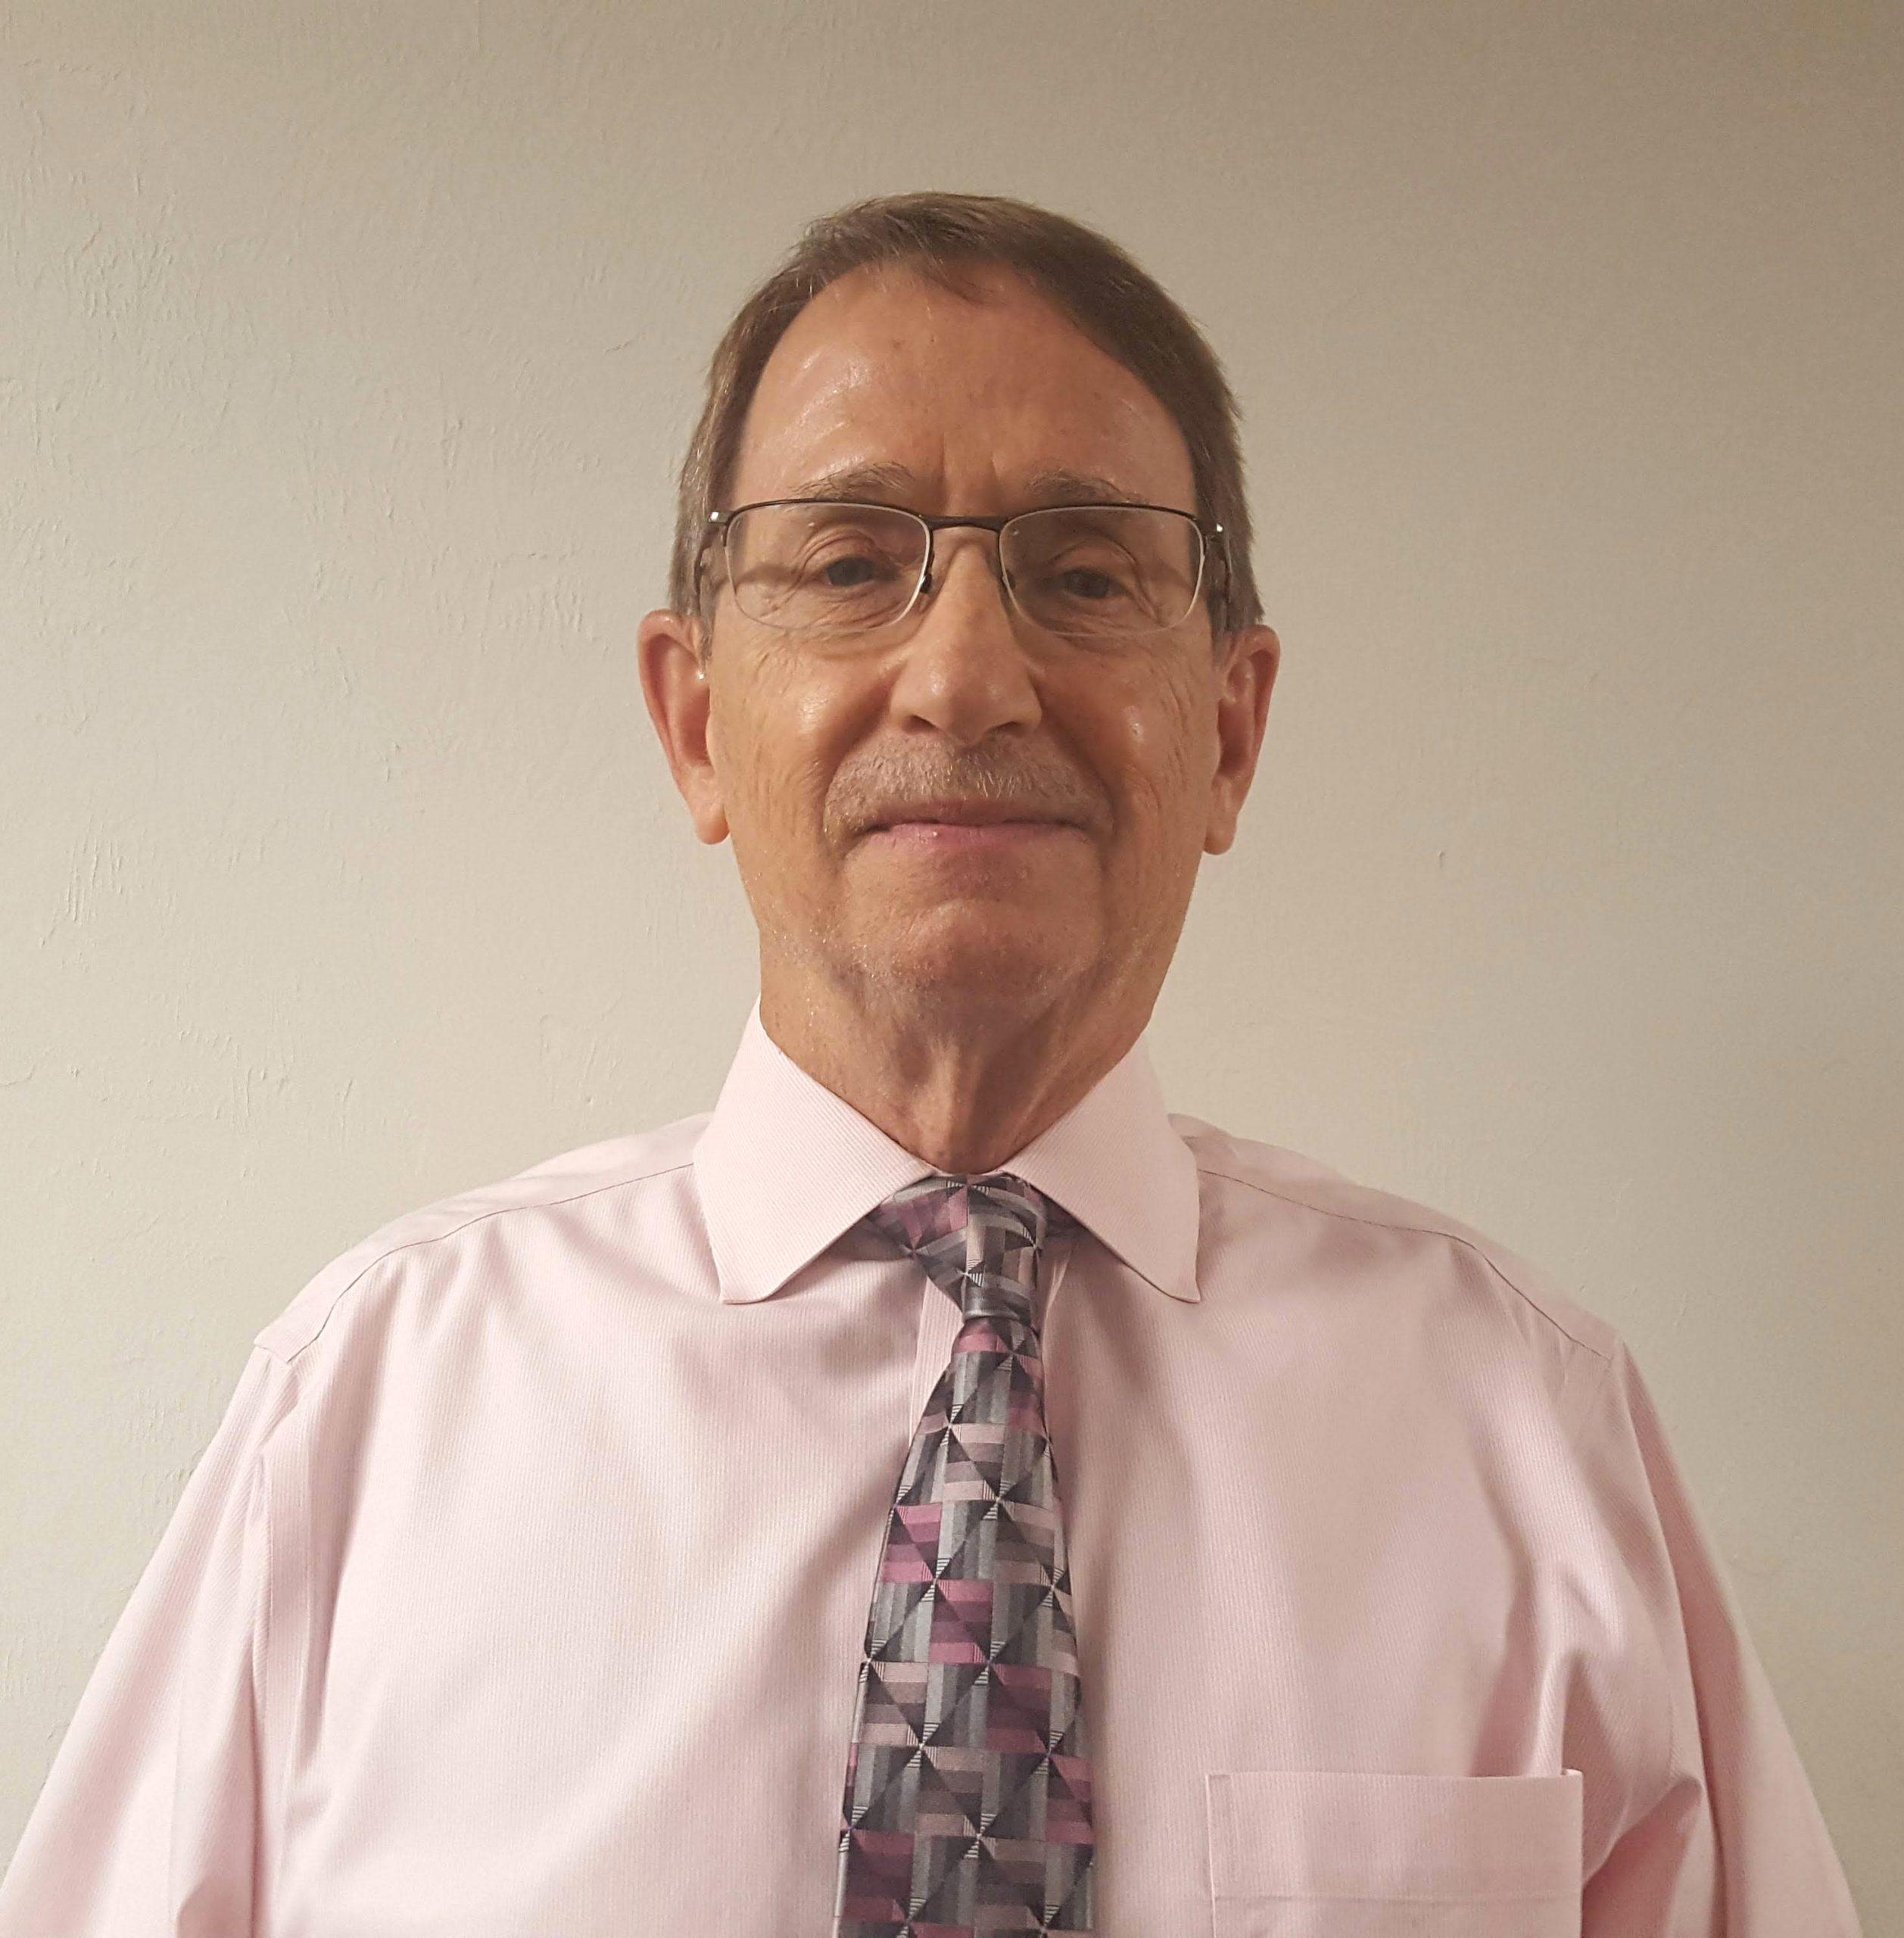 Dennis Fleetwood, Interim Director, Environmental Health & Safety